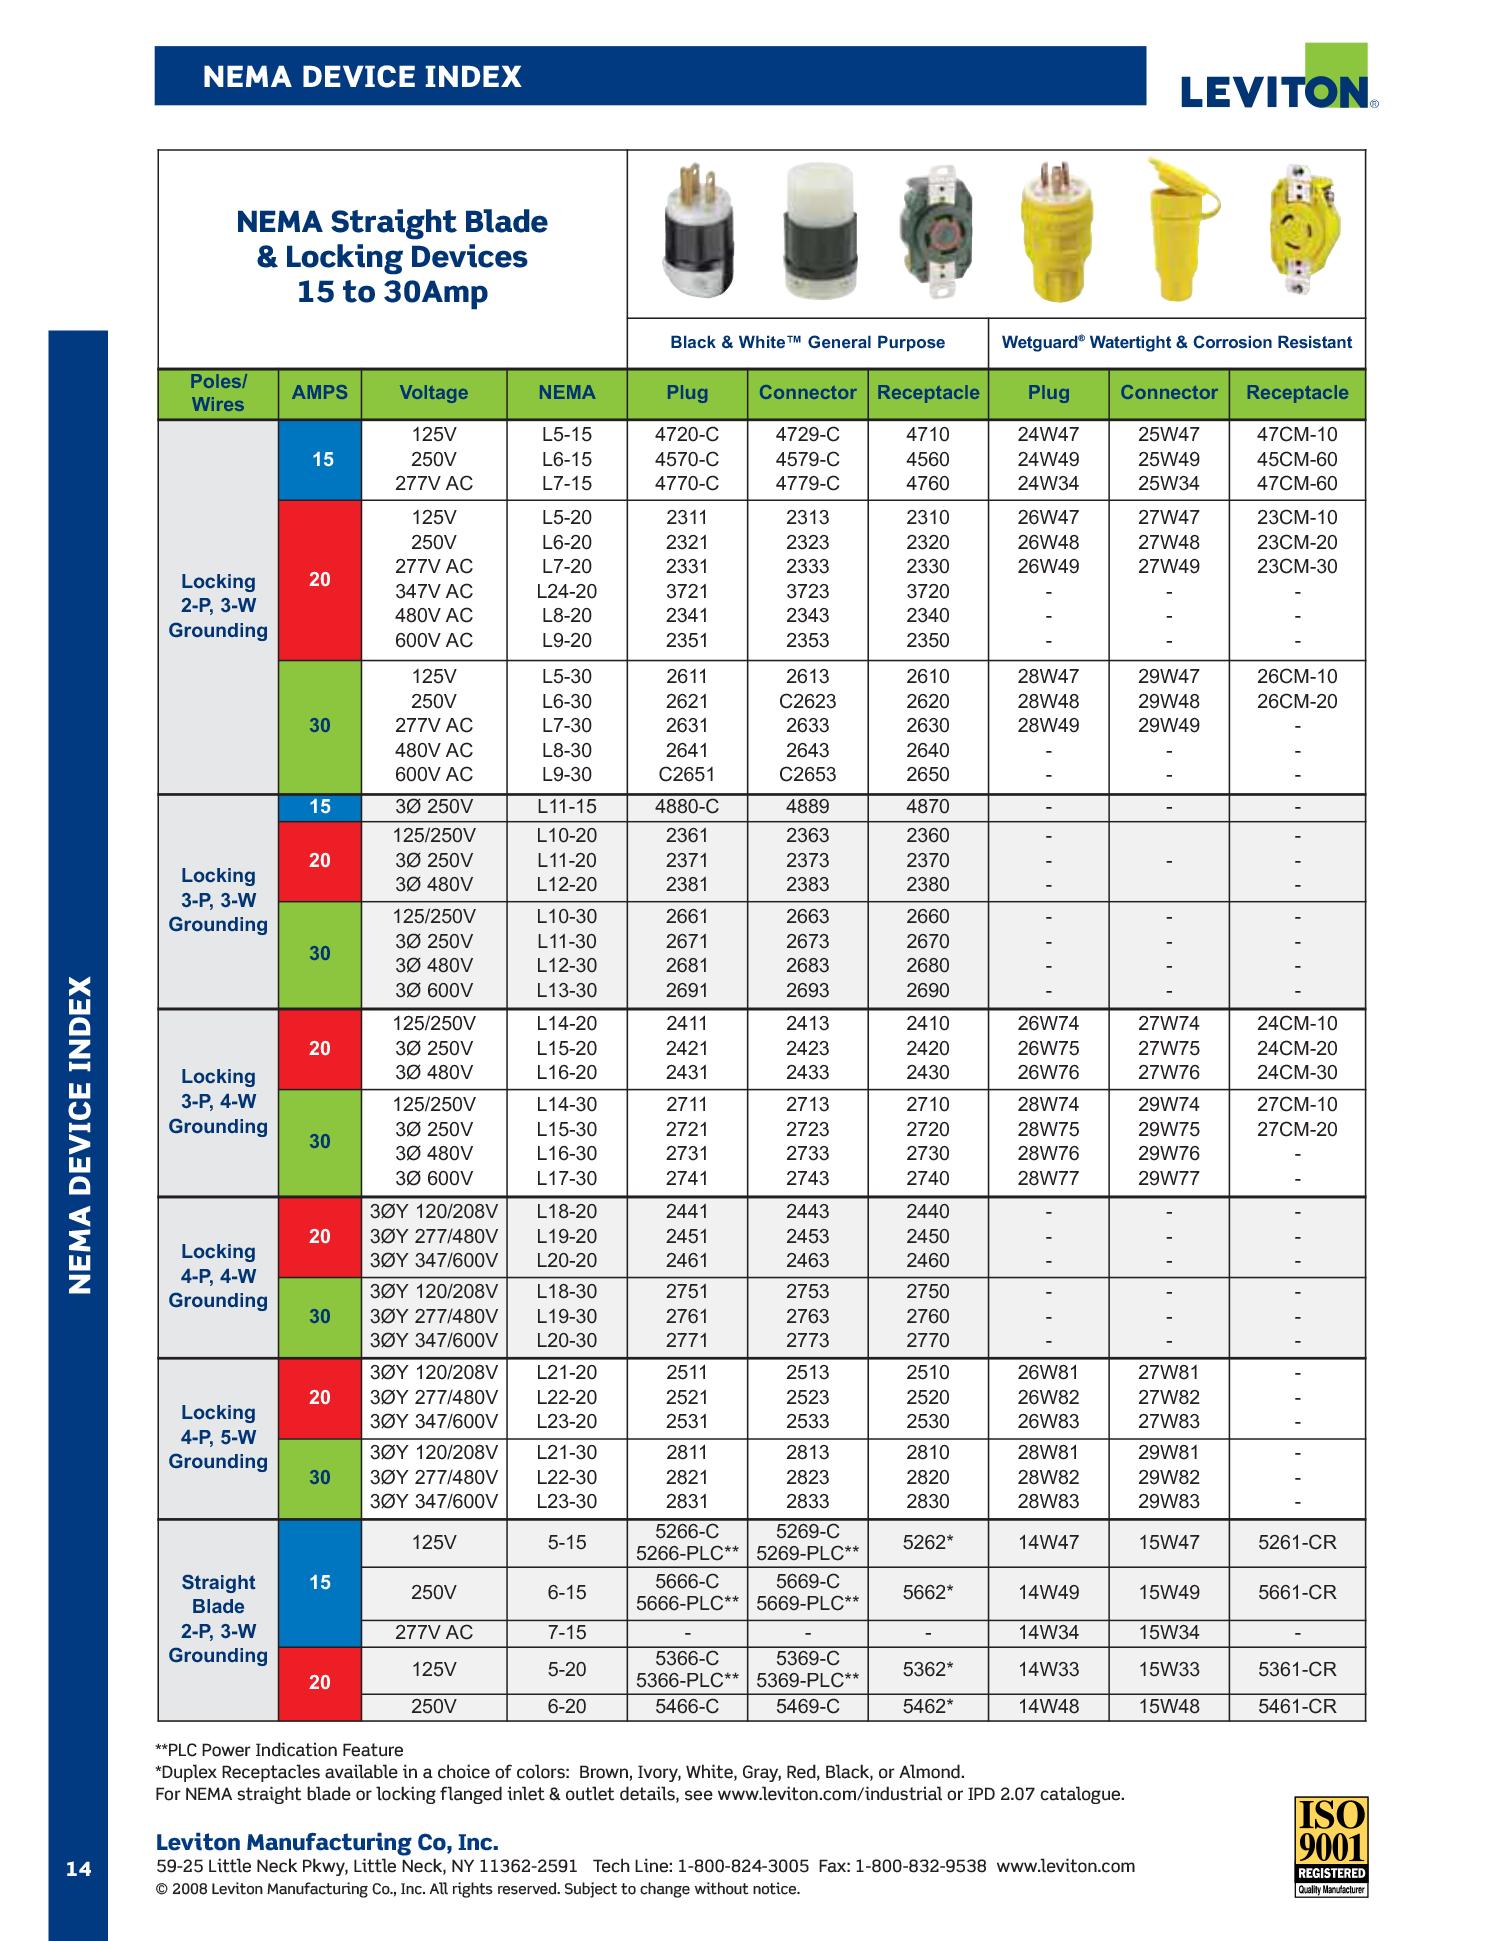 NEMA Device Index